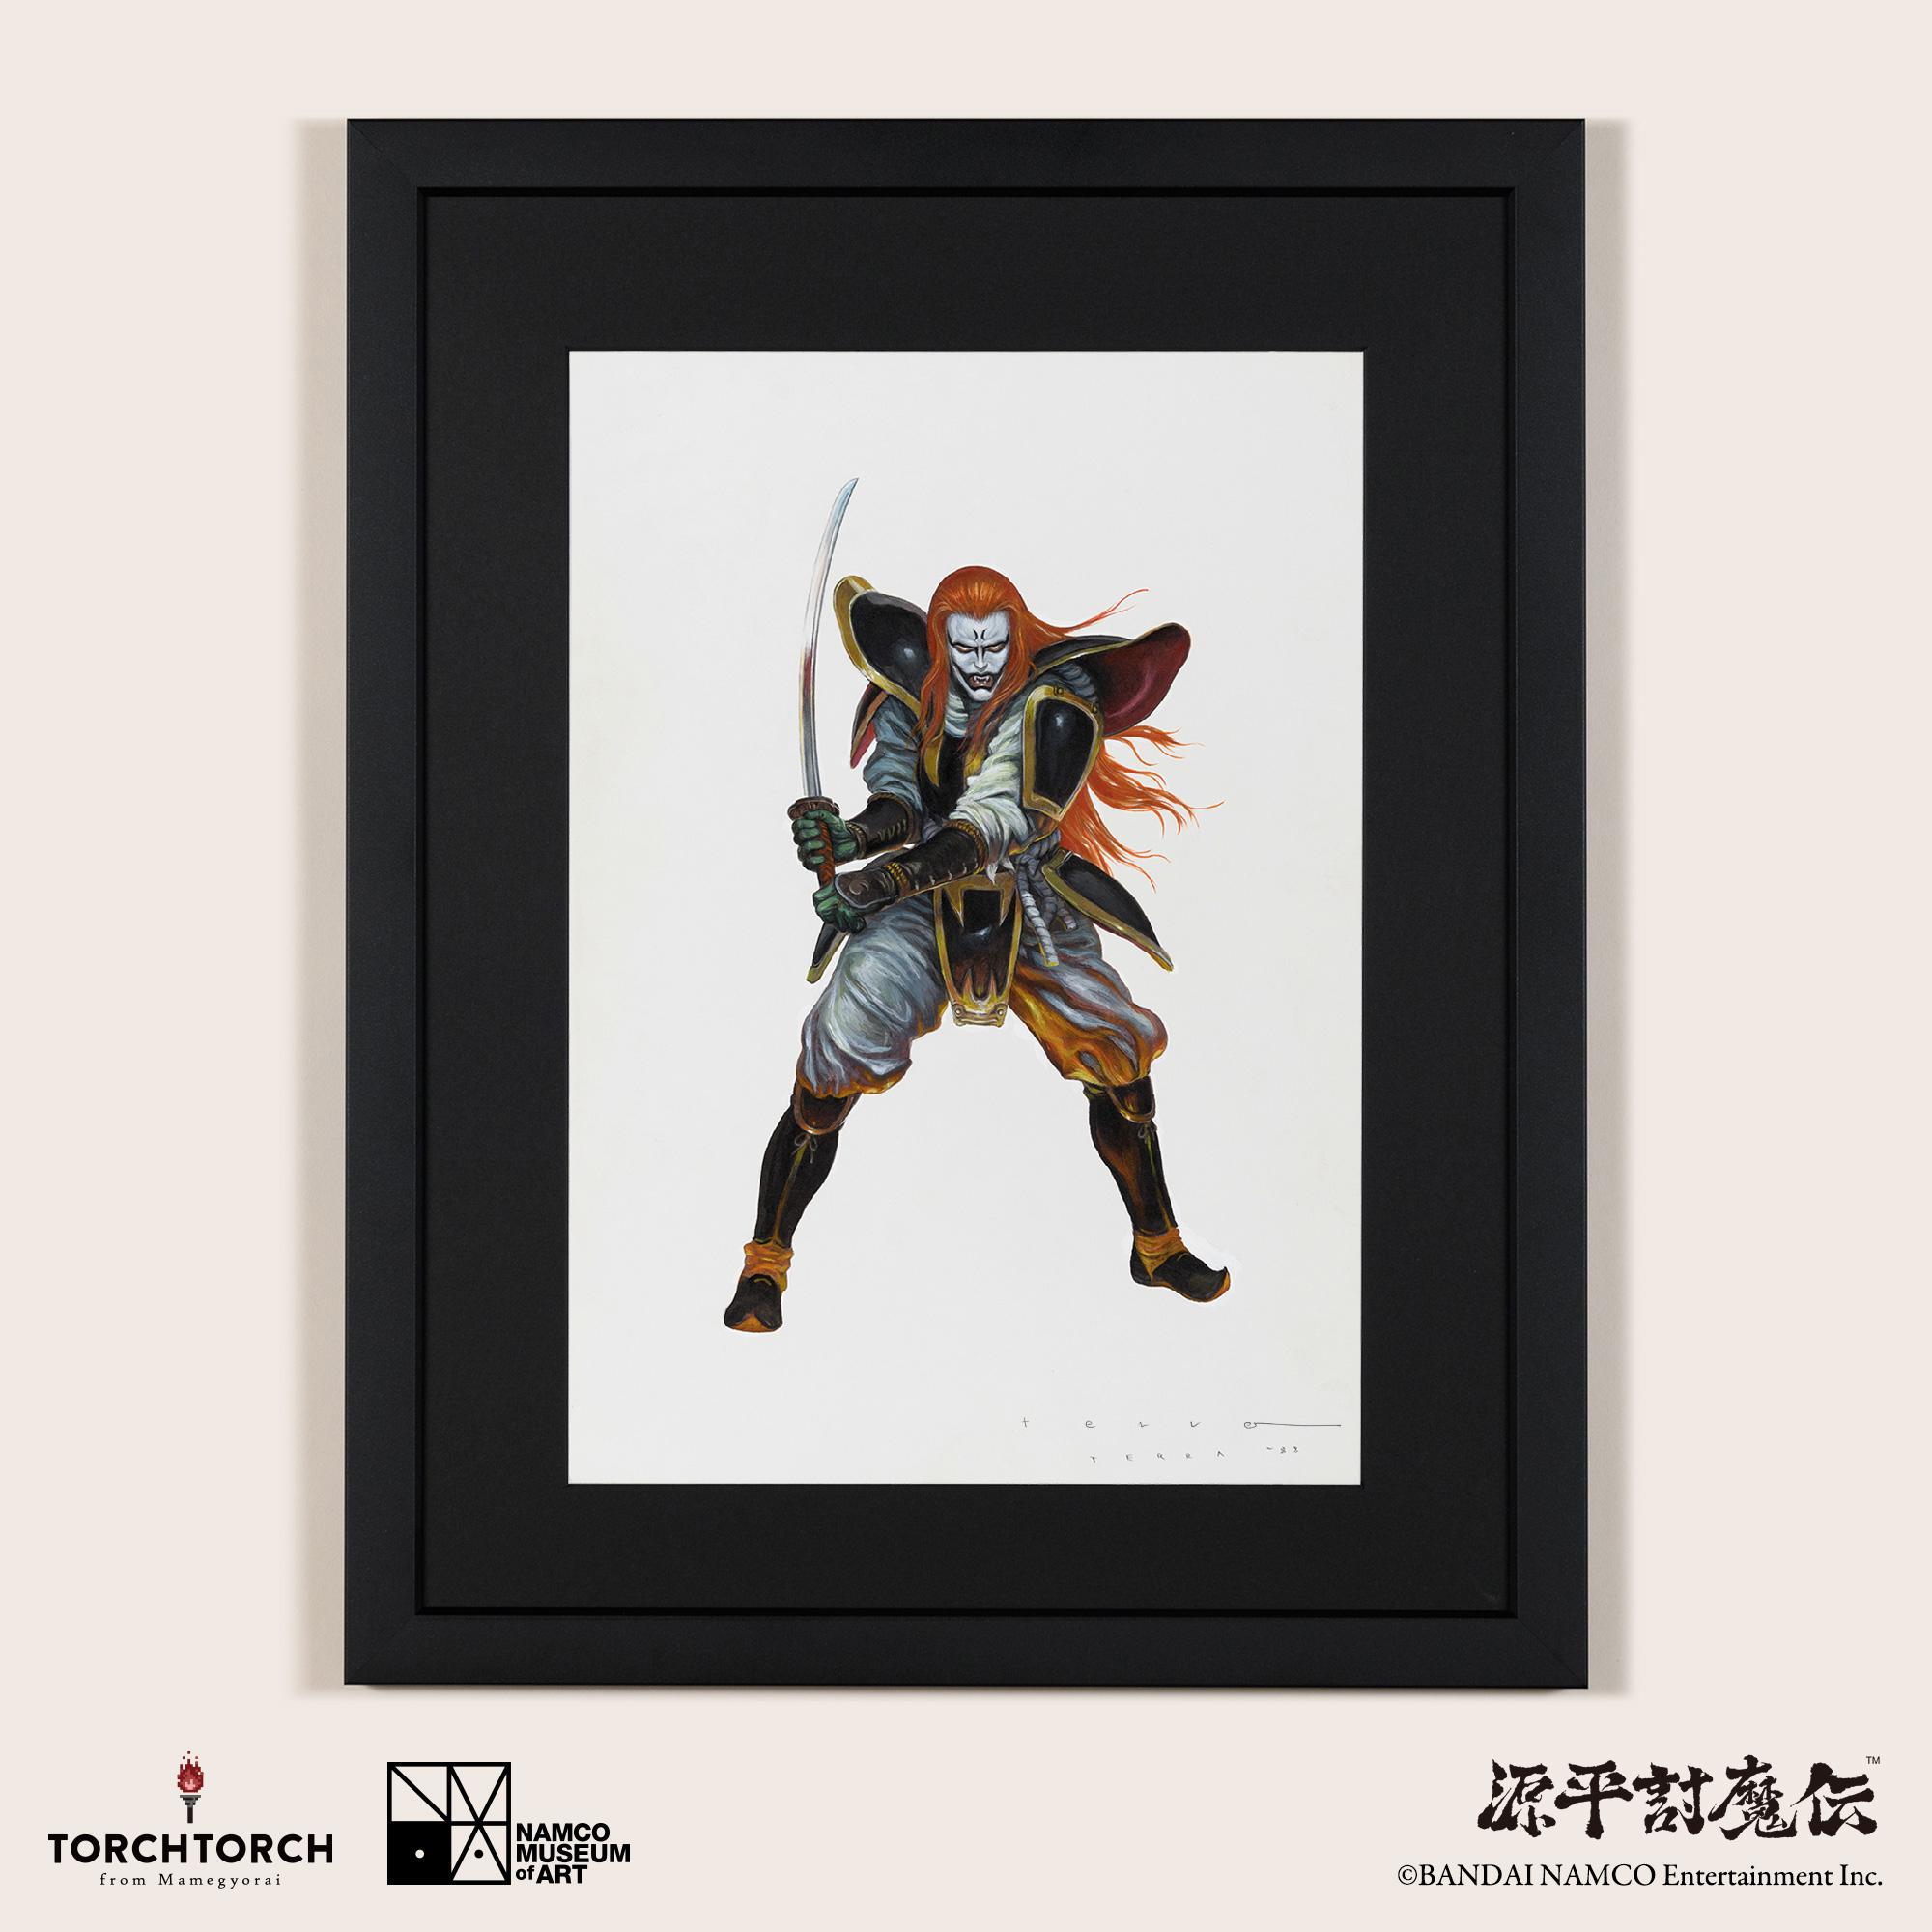 Genpei Touma Den Key Visual by Katsuya Terada NAMCO MUSEUM of ART × TORCH TORCH